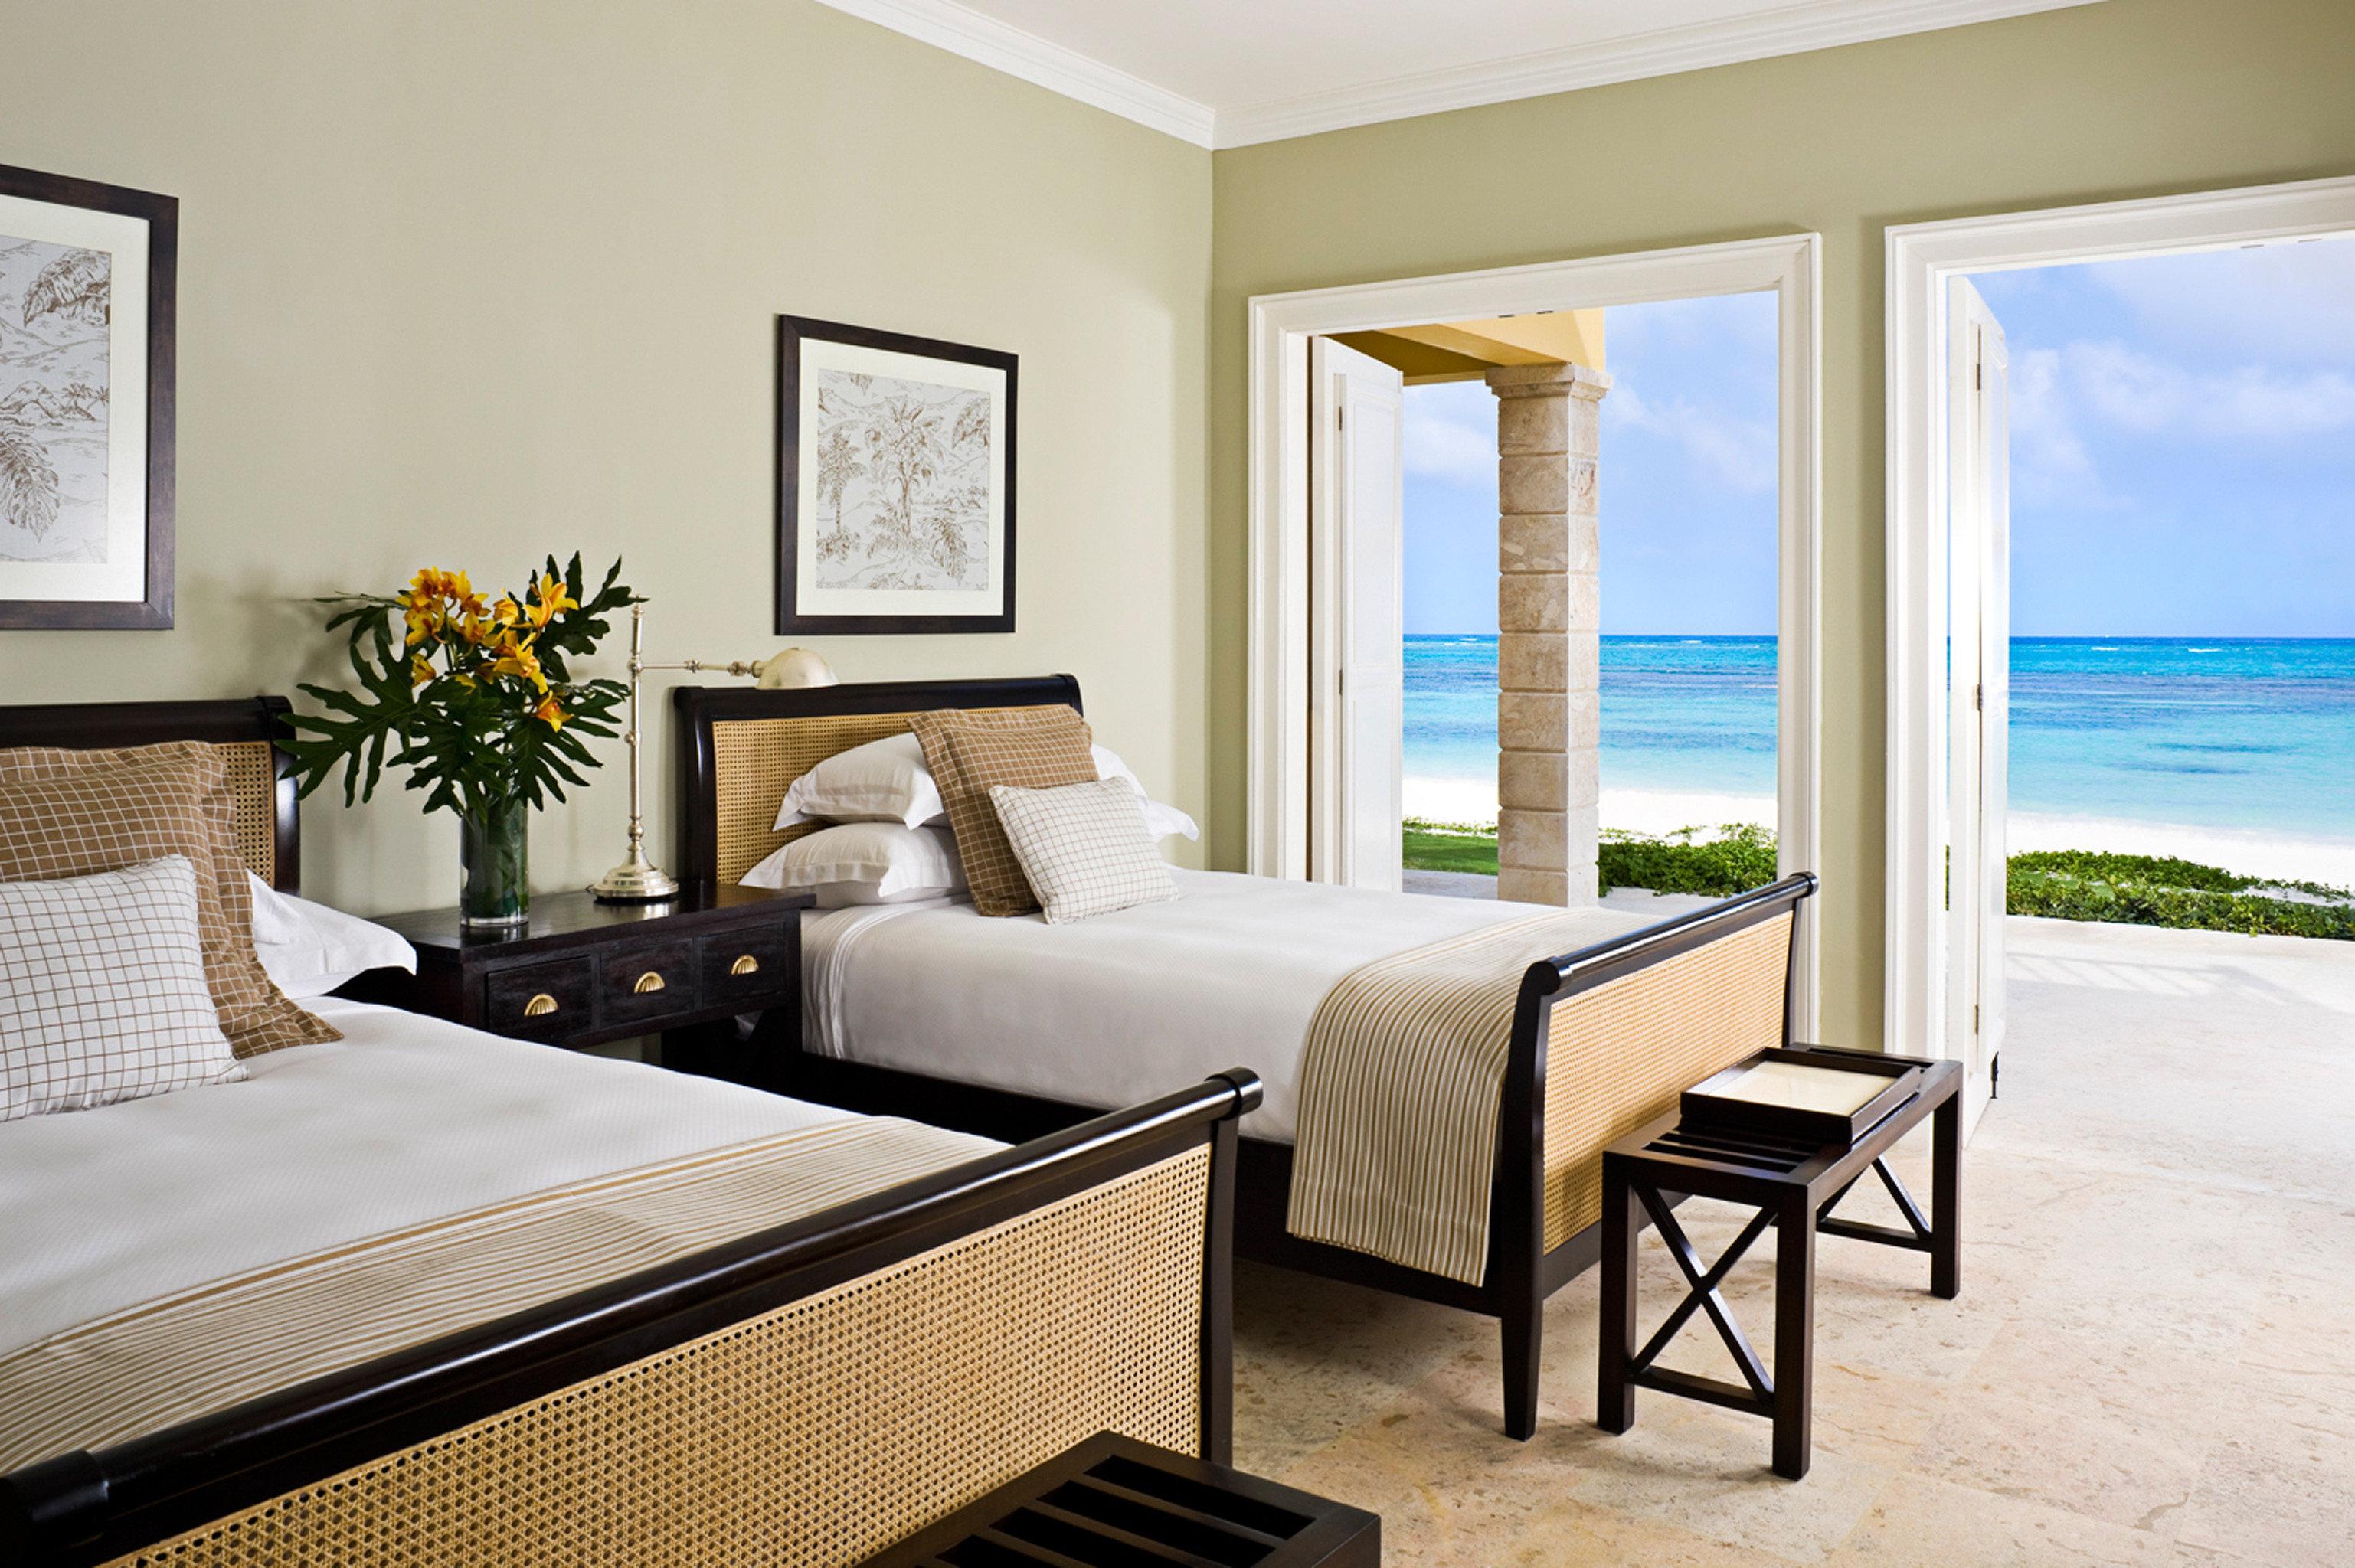 Beachfront Bedroom Luxury Modern Resort Suite property home living room Villa condominium cottage